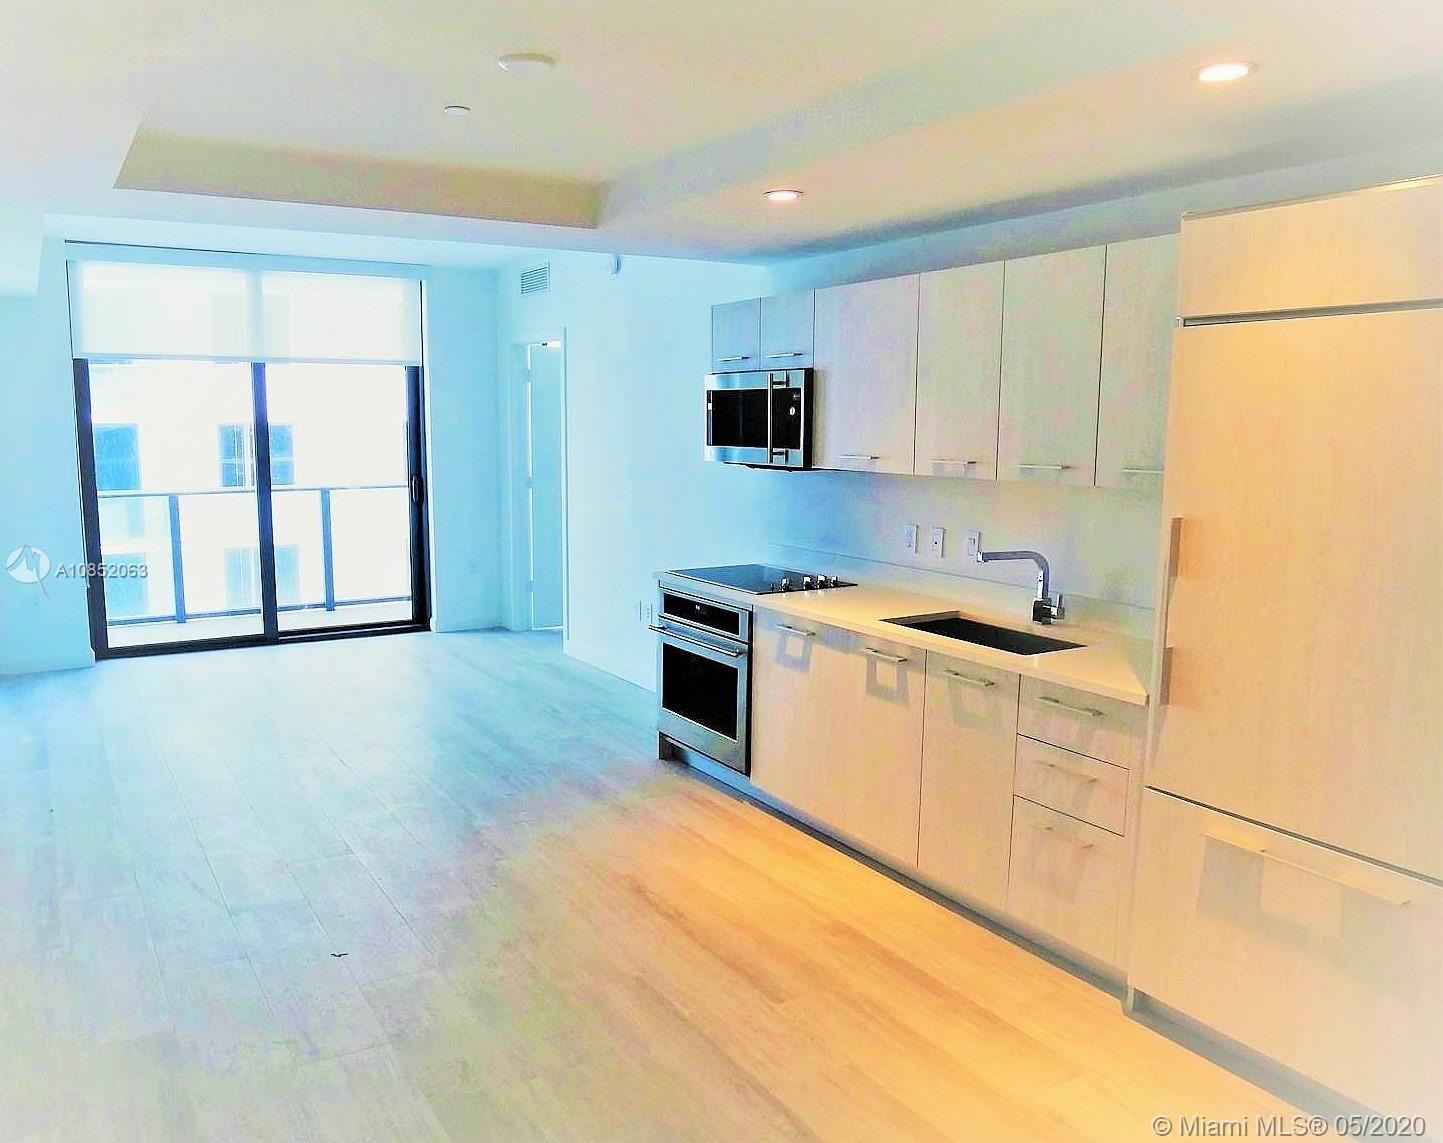 55 SW 9 Street # 3609, Miami, Florida 33130, 1 Bedroom Bedrooms, 1 Room Rooms,2 BathroomsBathrooms,Residential,For Sale,55 SW 9 Street # 3609,A10852063